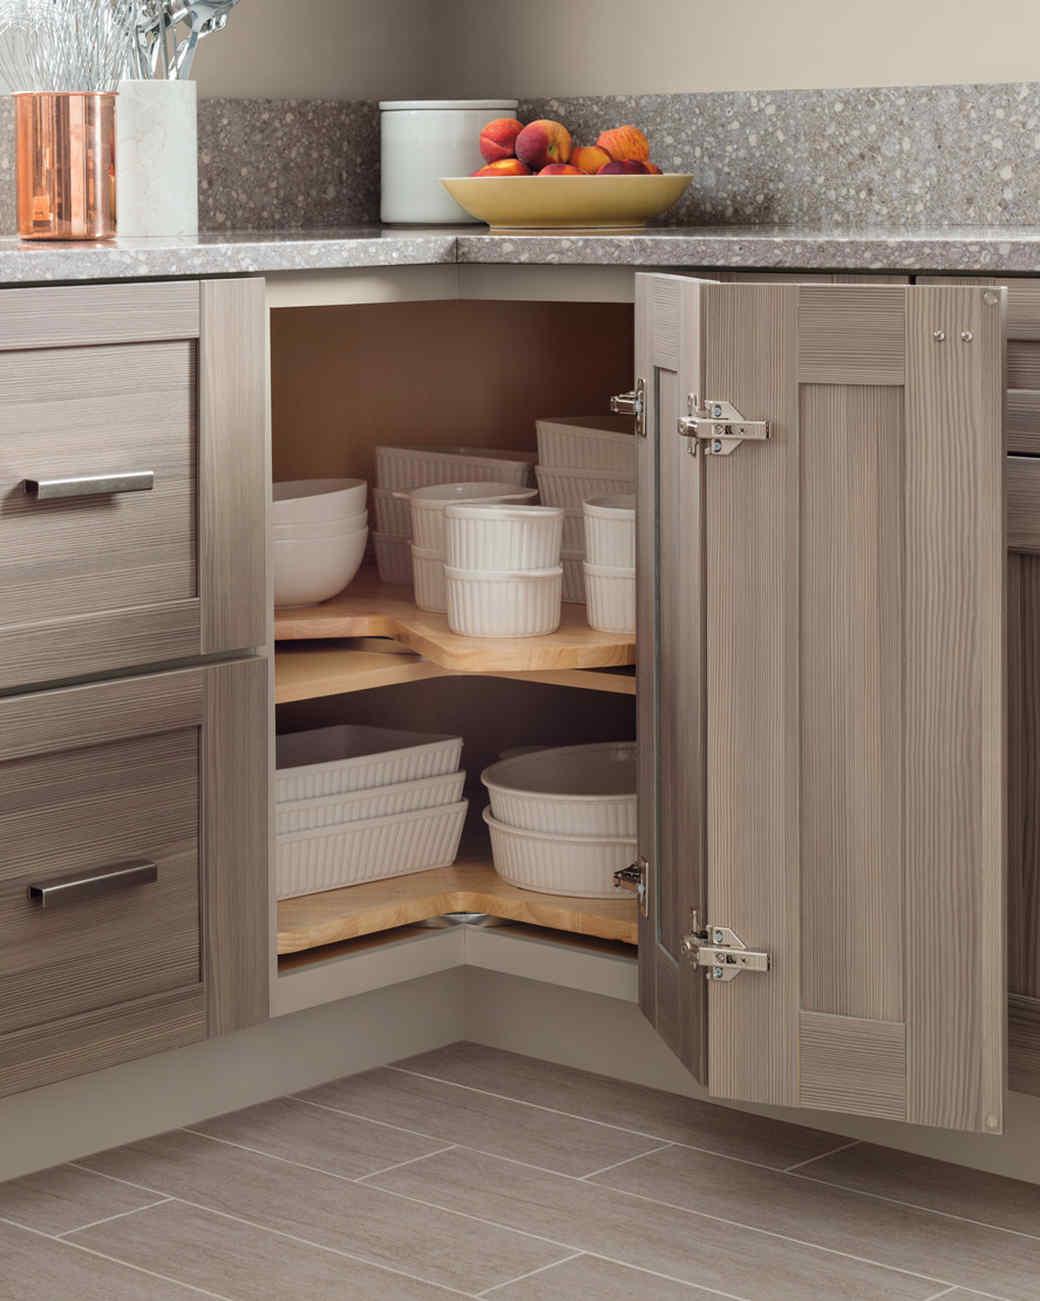 Fullsize Of Martha Stewart Cabinets